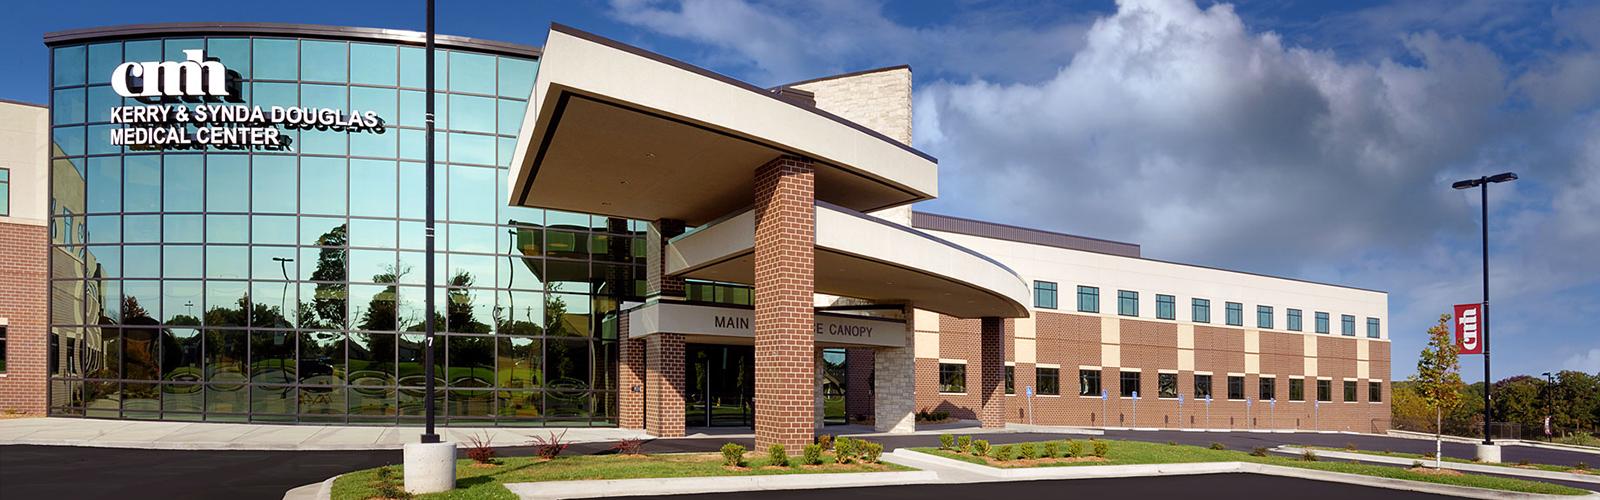 HMN Architects